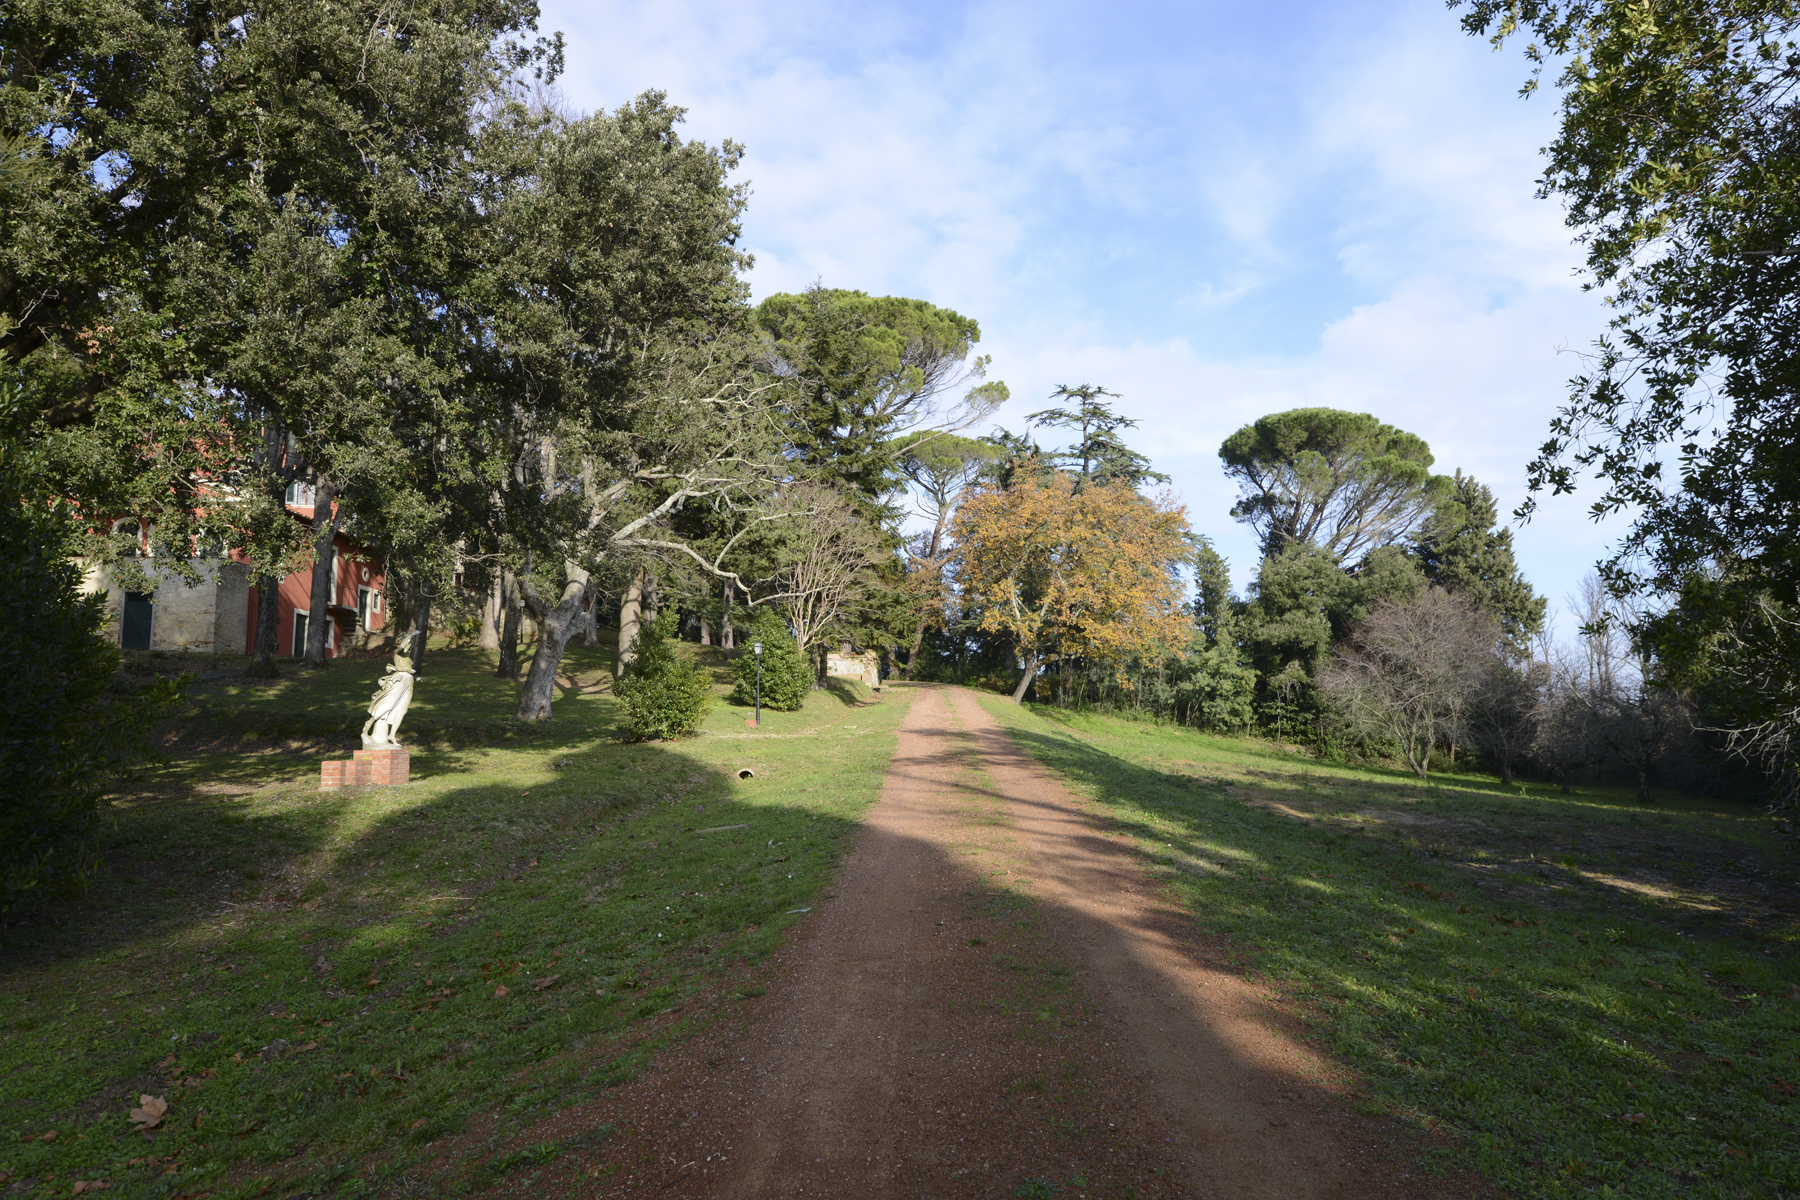 Villa in Vendita a Casciana Terme Lari: 5 locali, 1800 mq - Foto 29